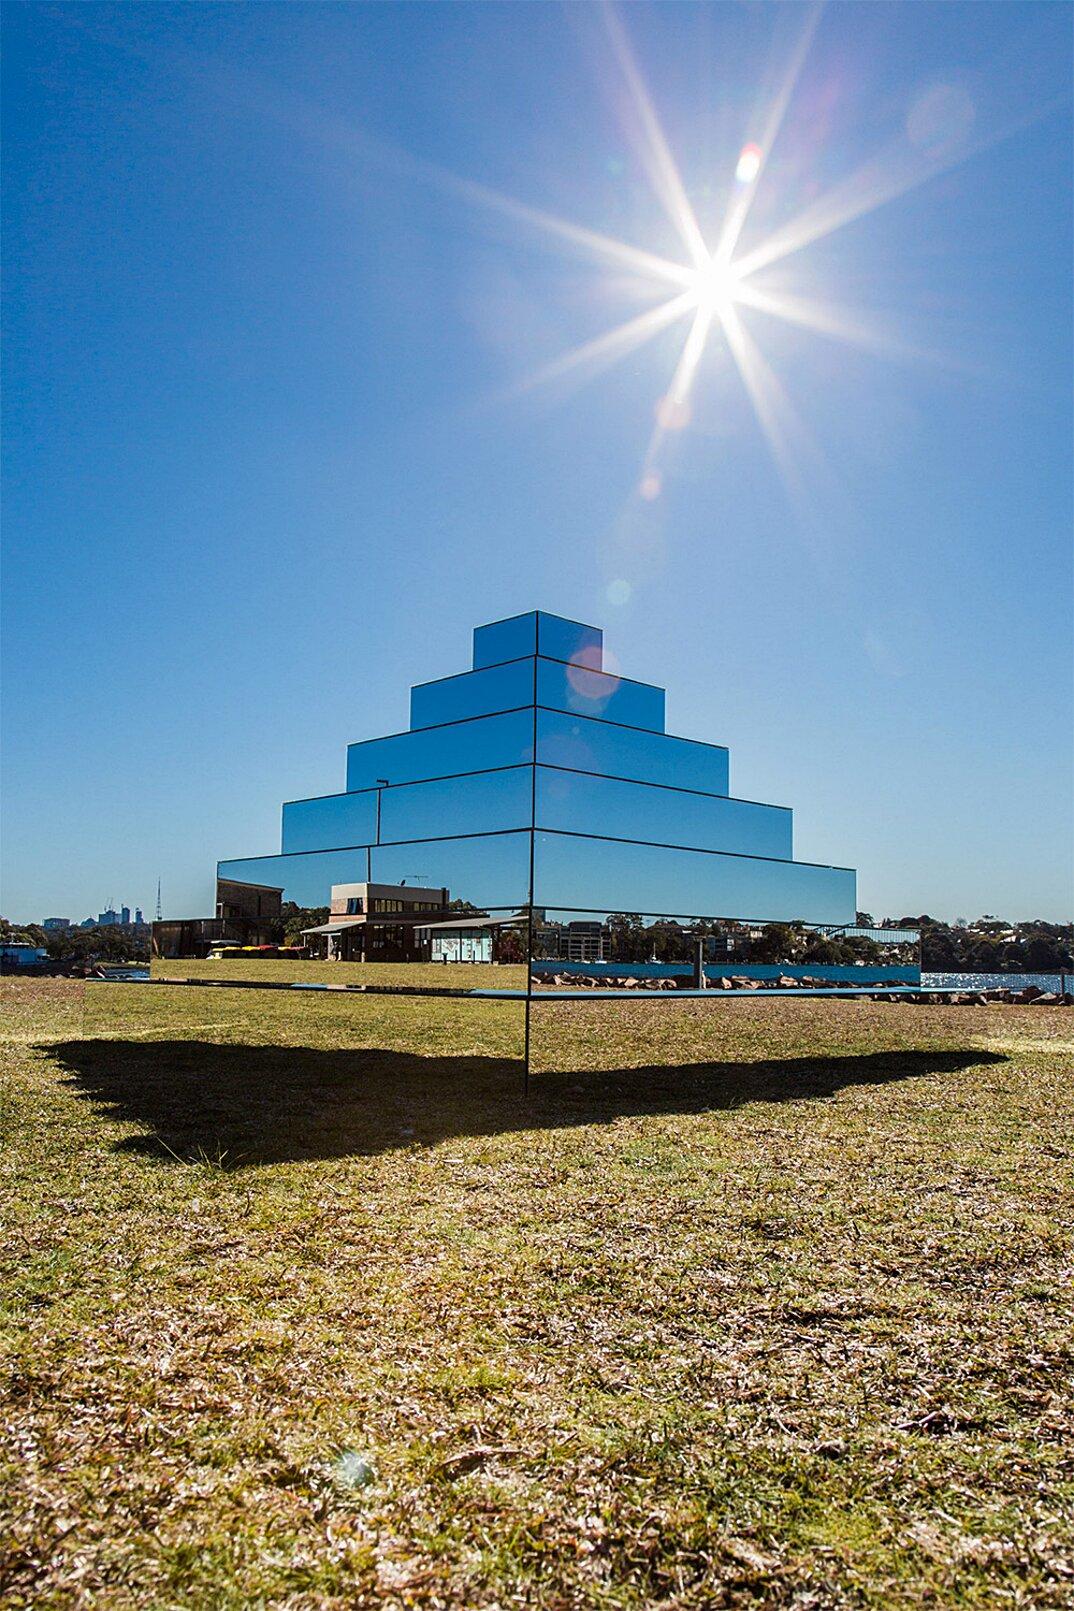 piramide-ziqqurat-specchi-arte-scultura-mirrored-ziggurat-shirin-abedinirad-2